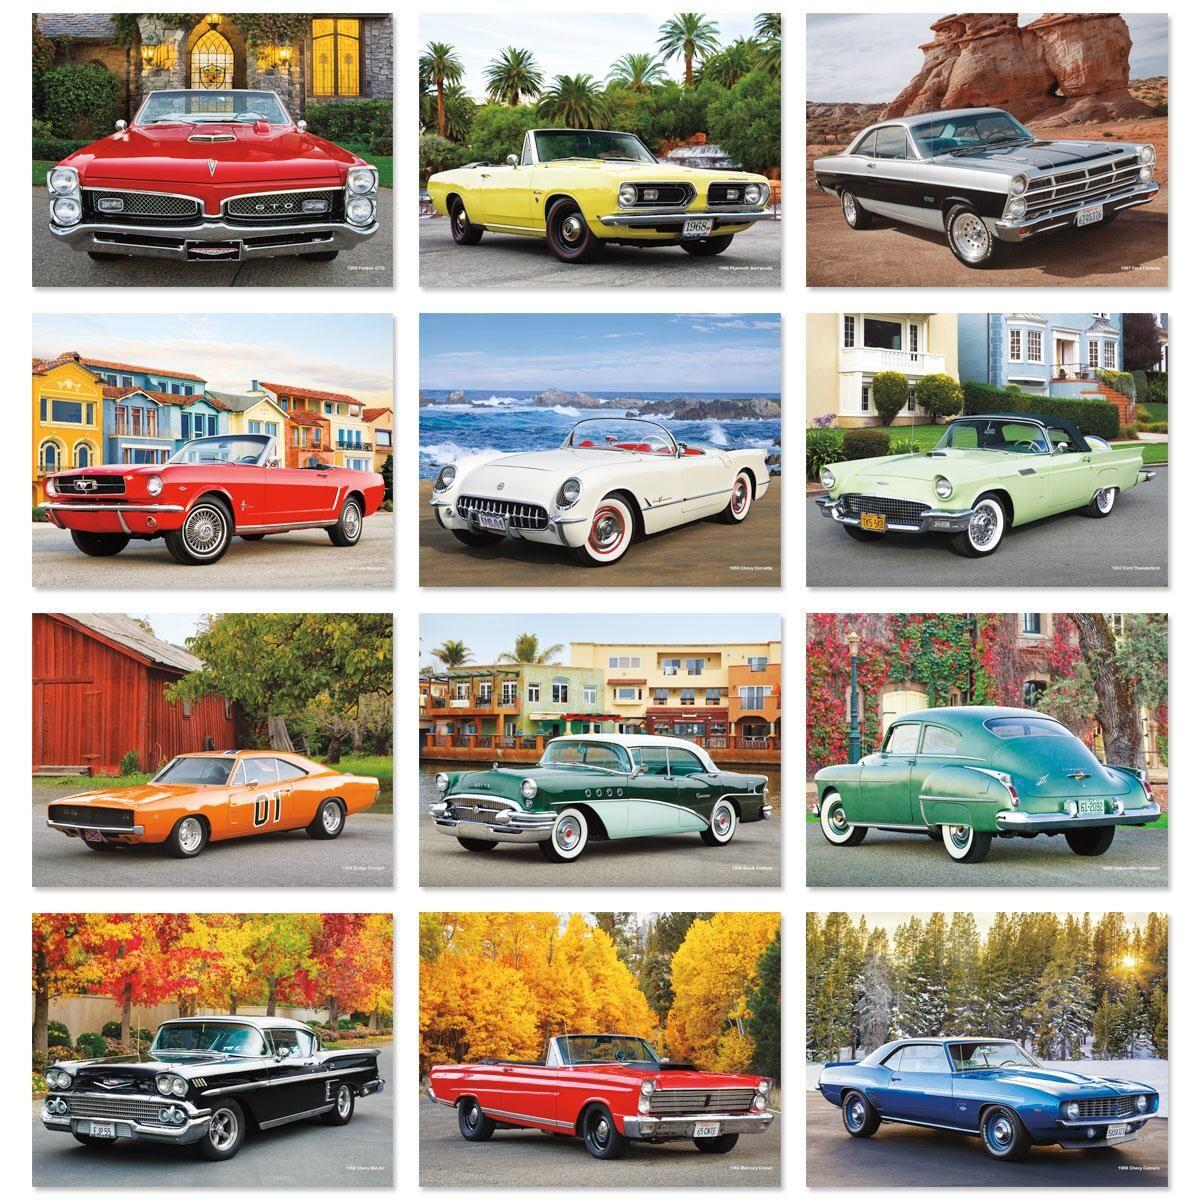 2018 Classic Cars Wall Calendar